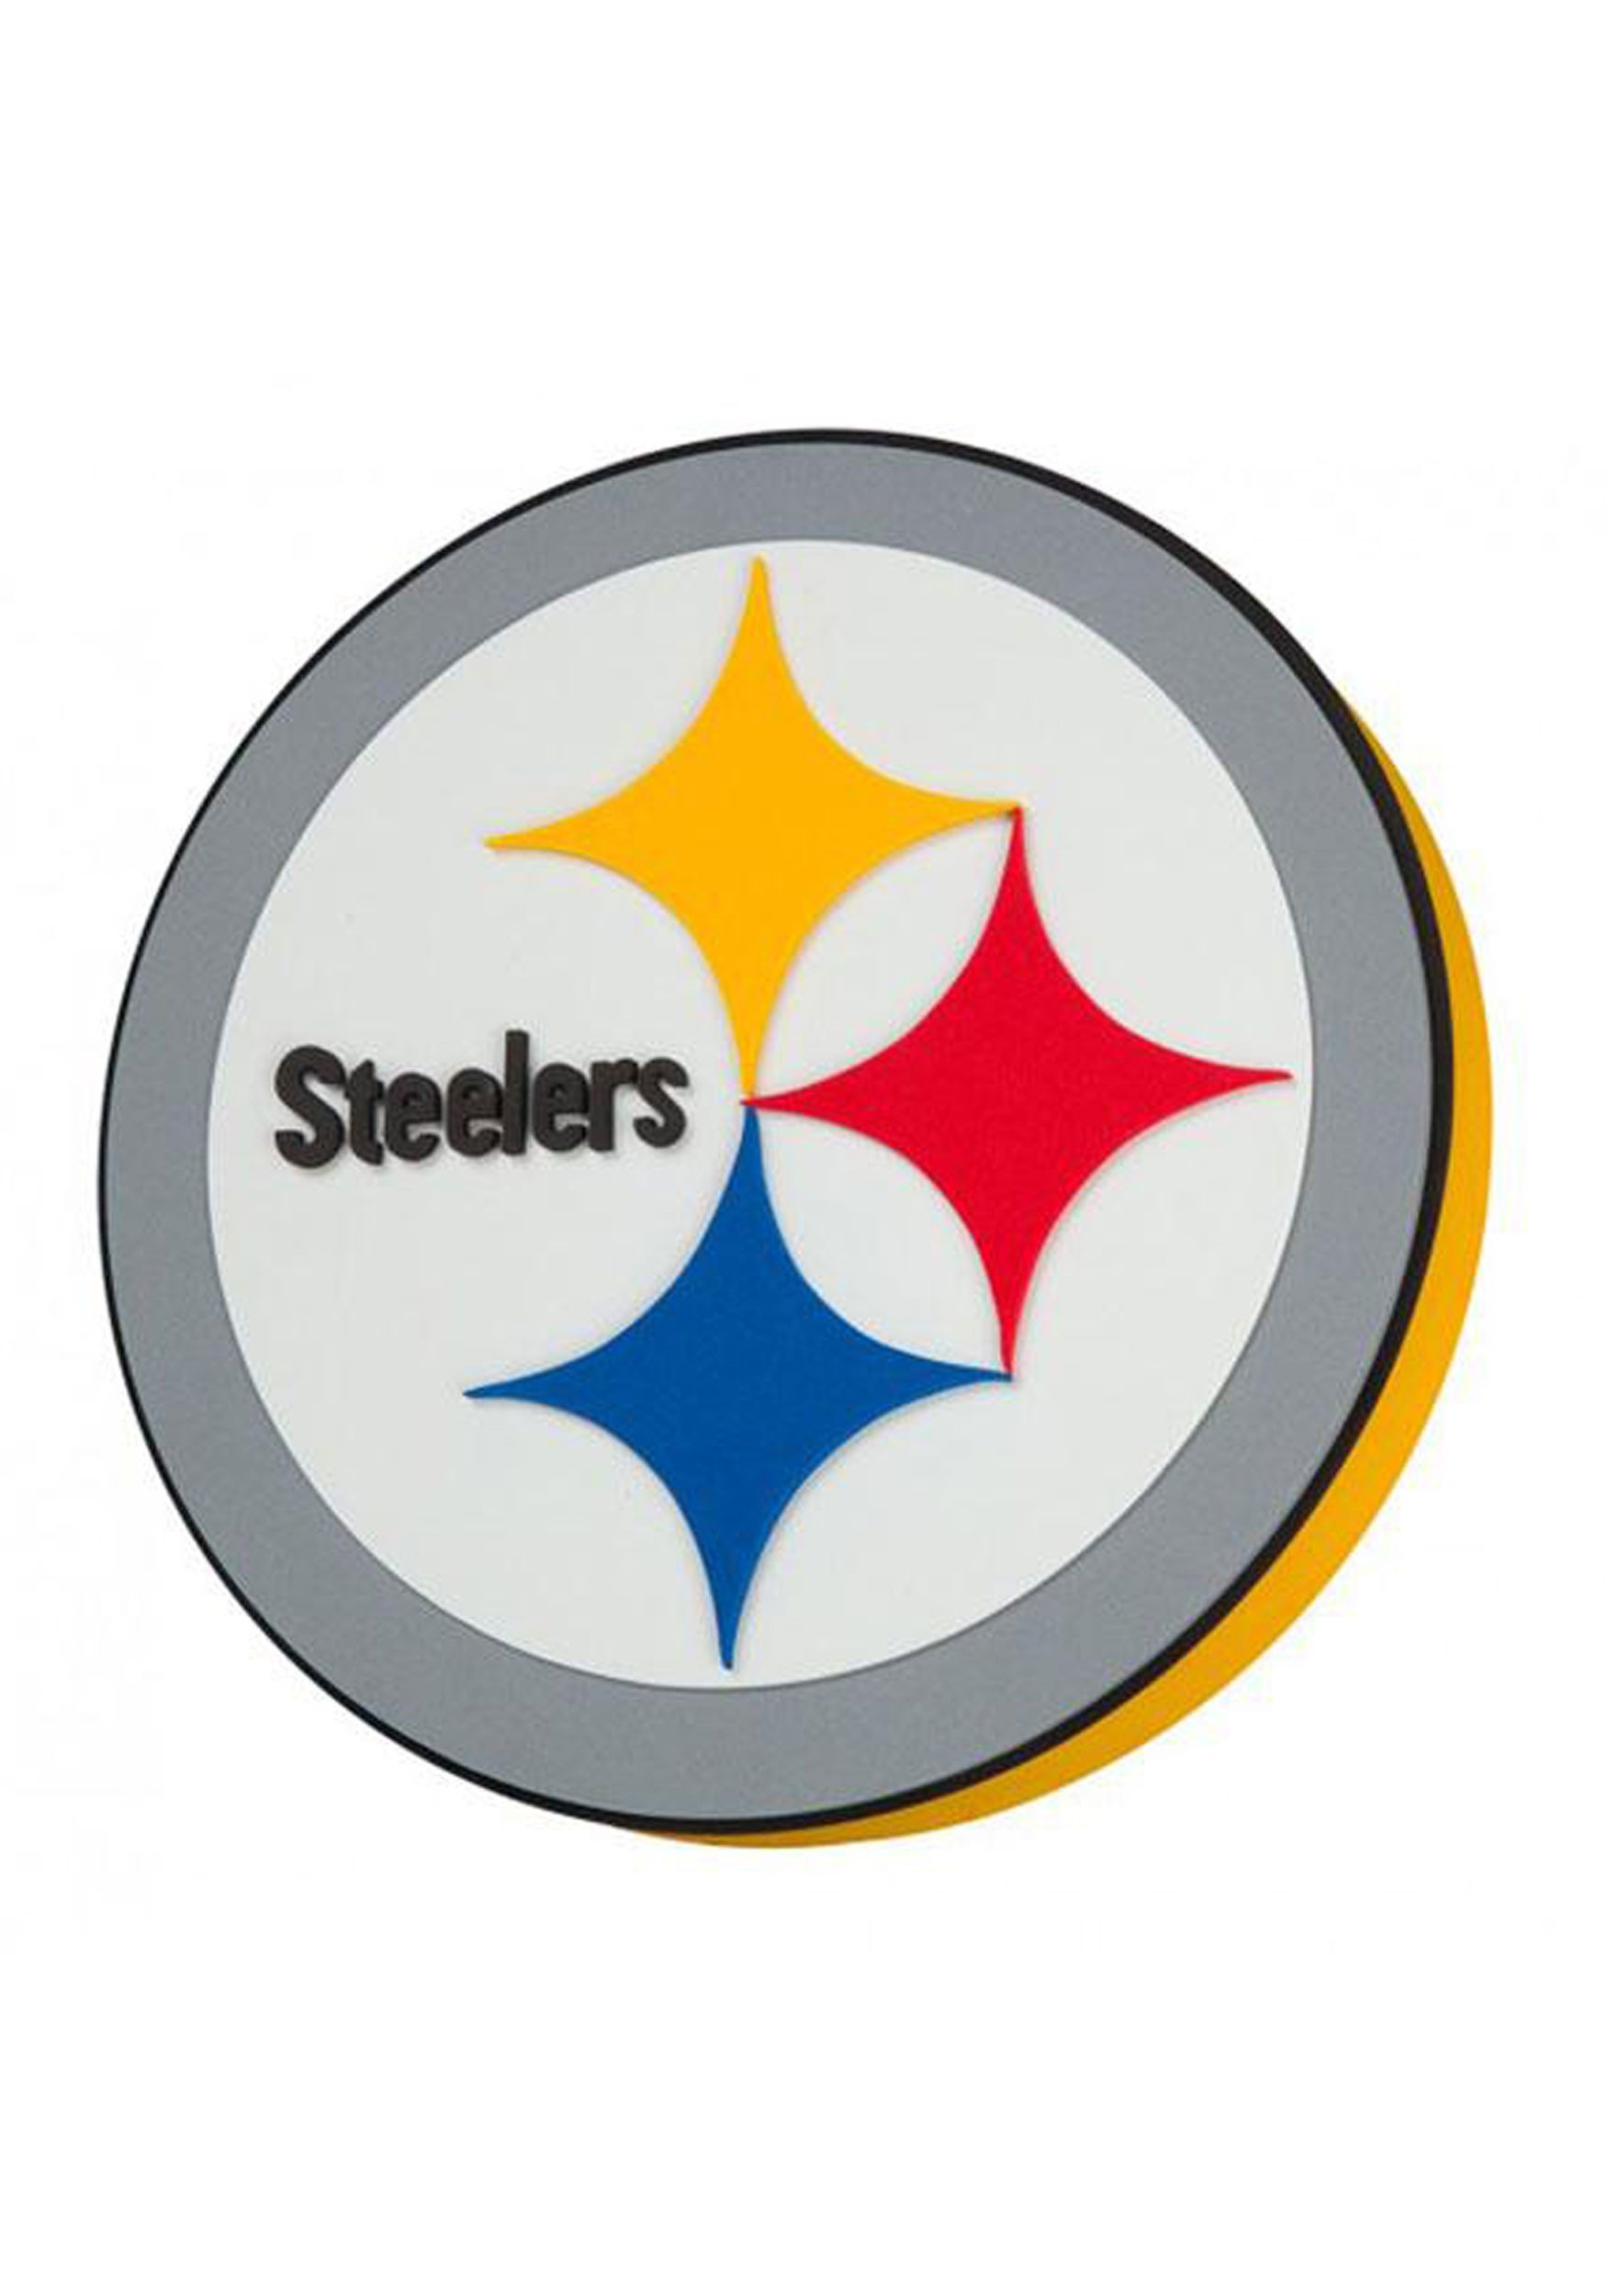 nfl pittsburgh steelers logo foam sign rh fun com pictures of steelers logo Steelers Logo Drawing